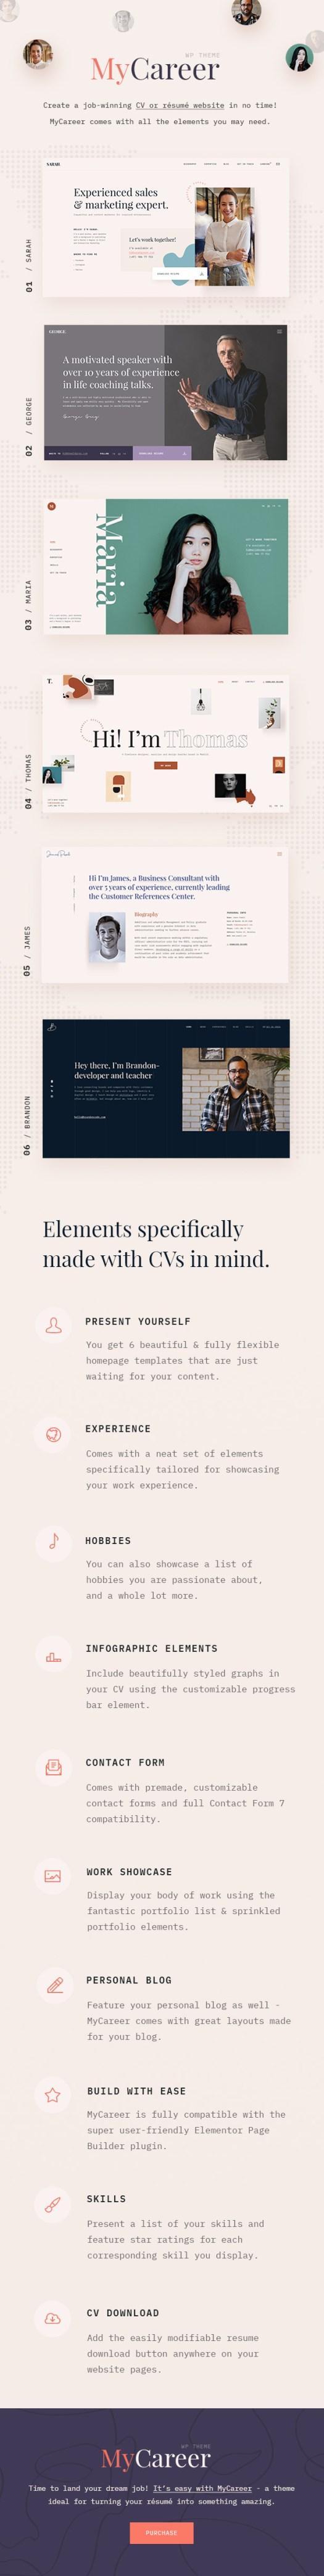 MyCareer - Resume WordPress Theme - 1